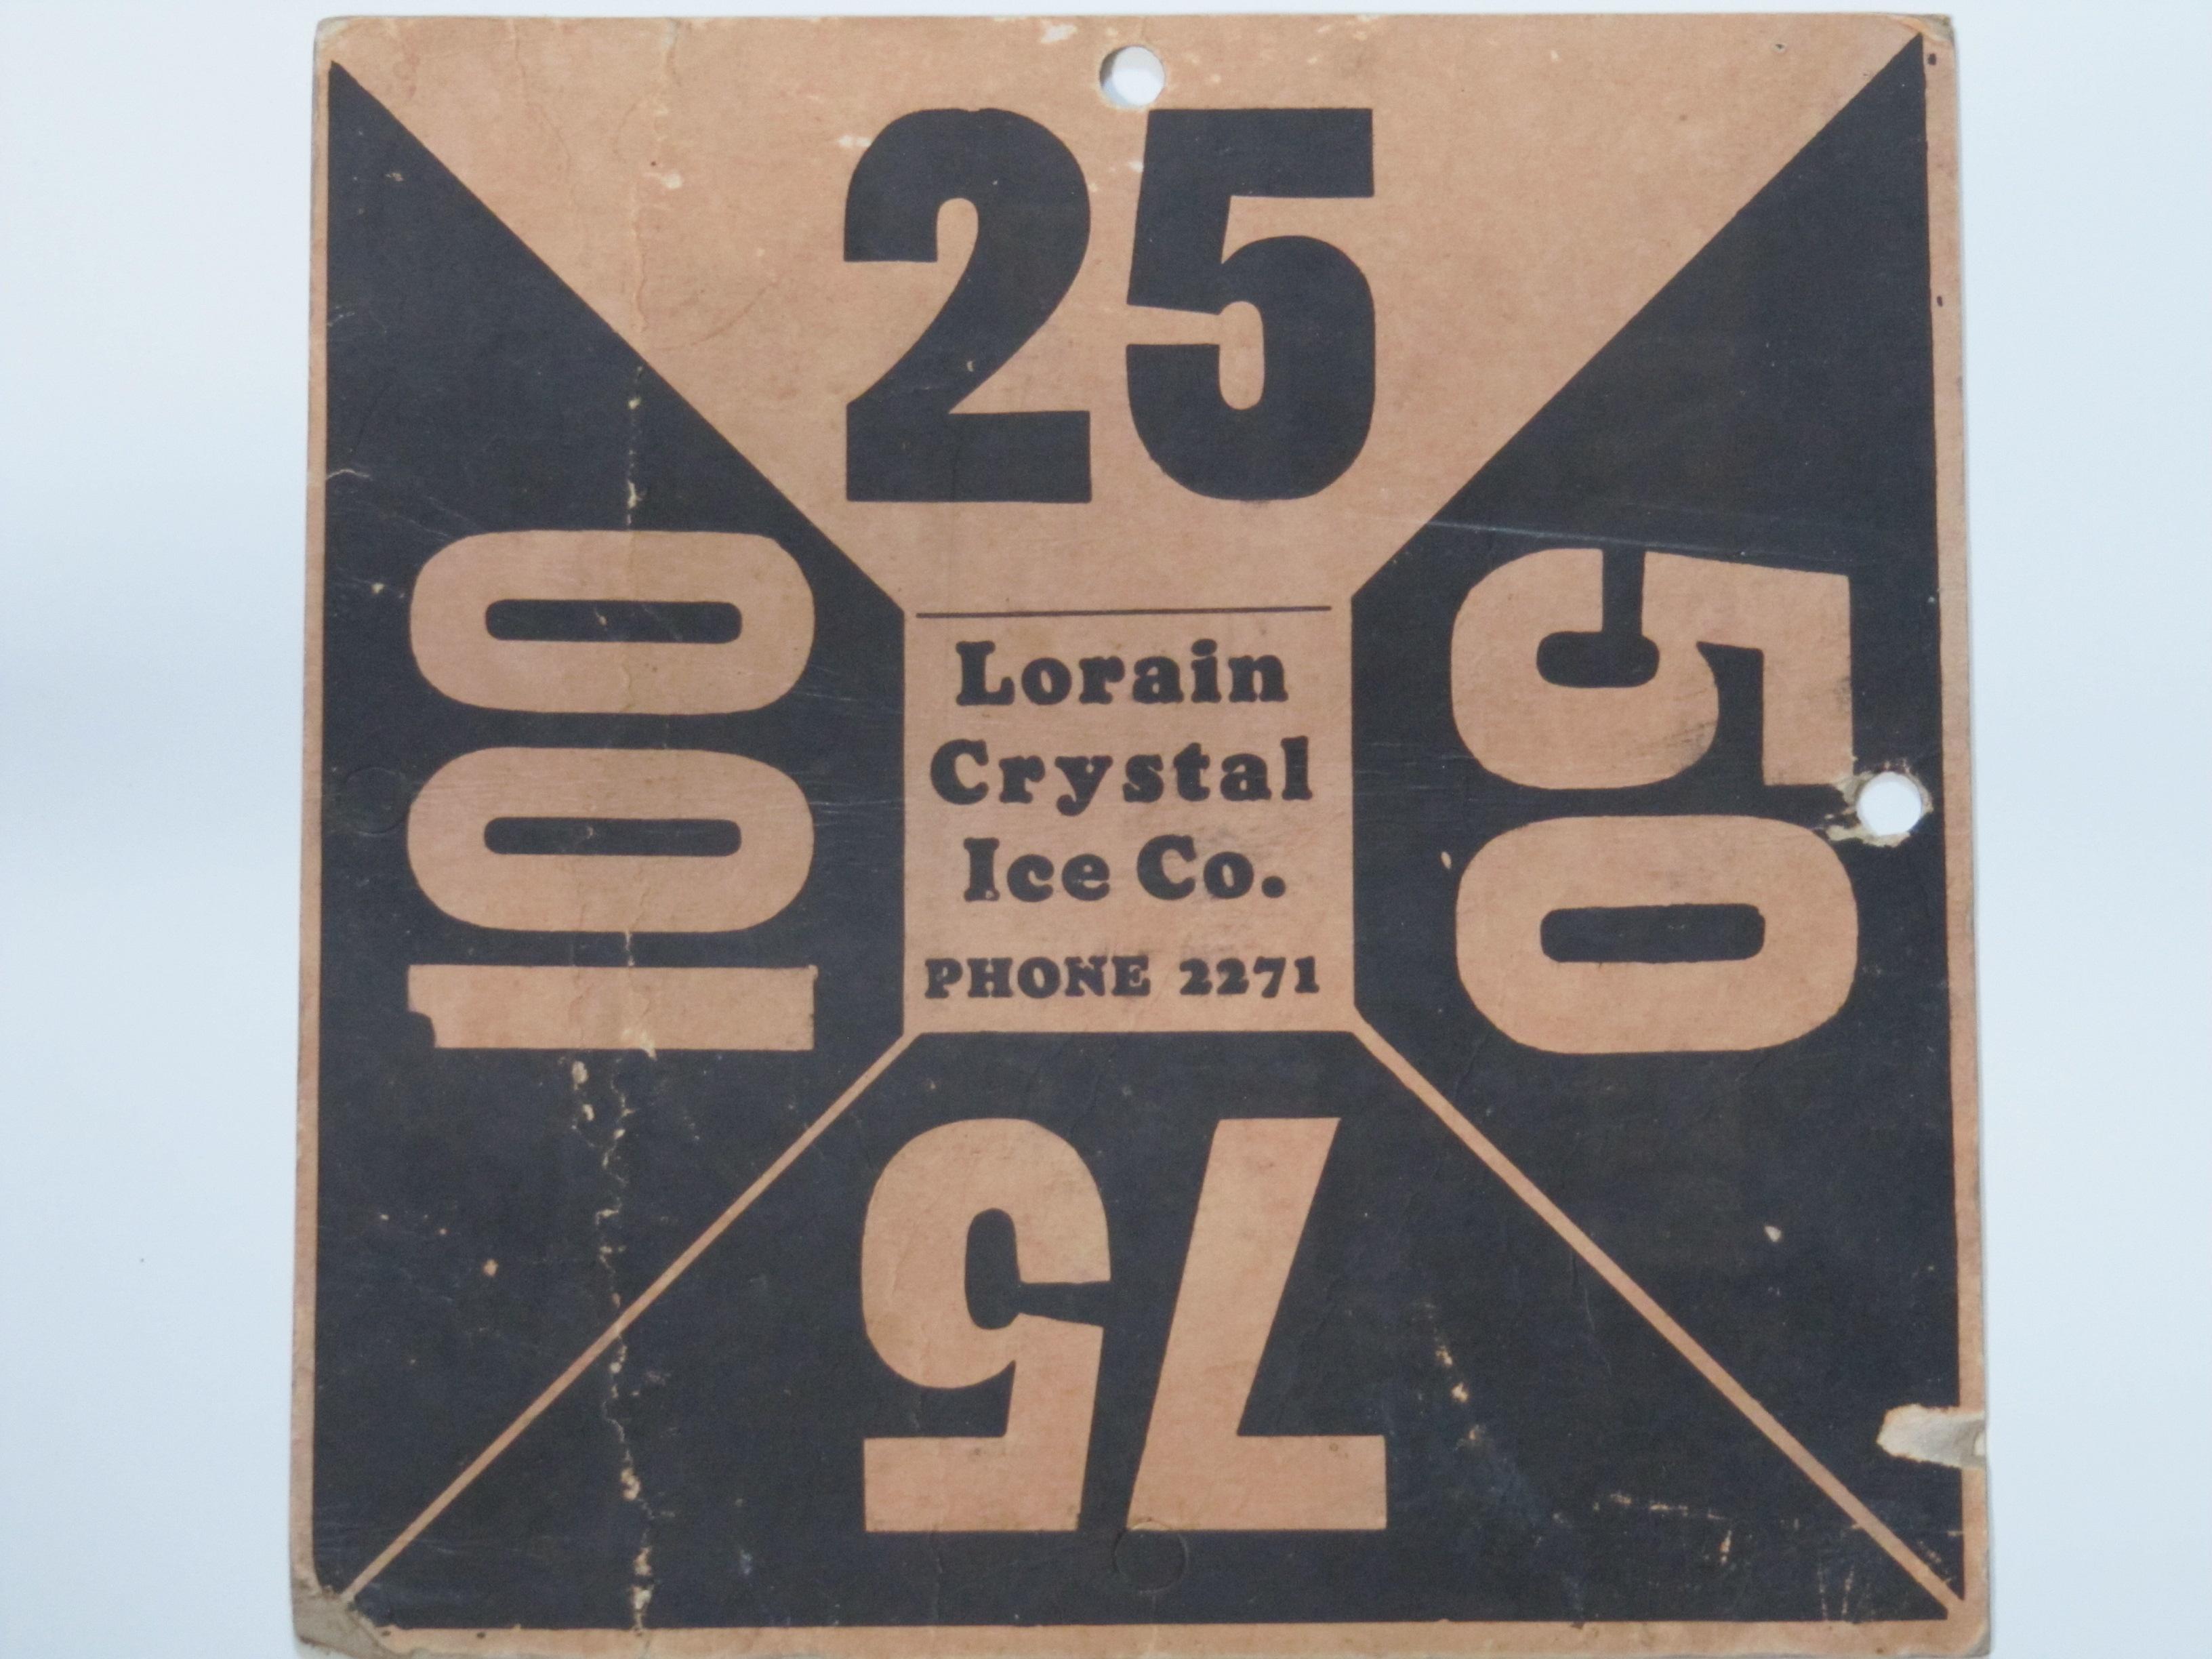 Lorain Crystal Ice Co.